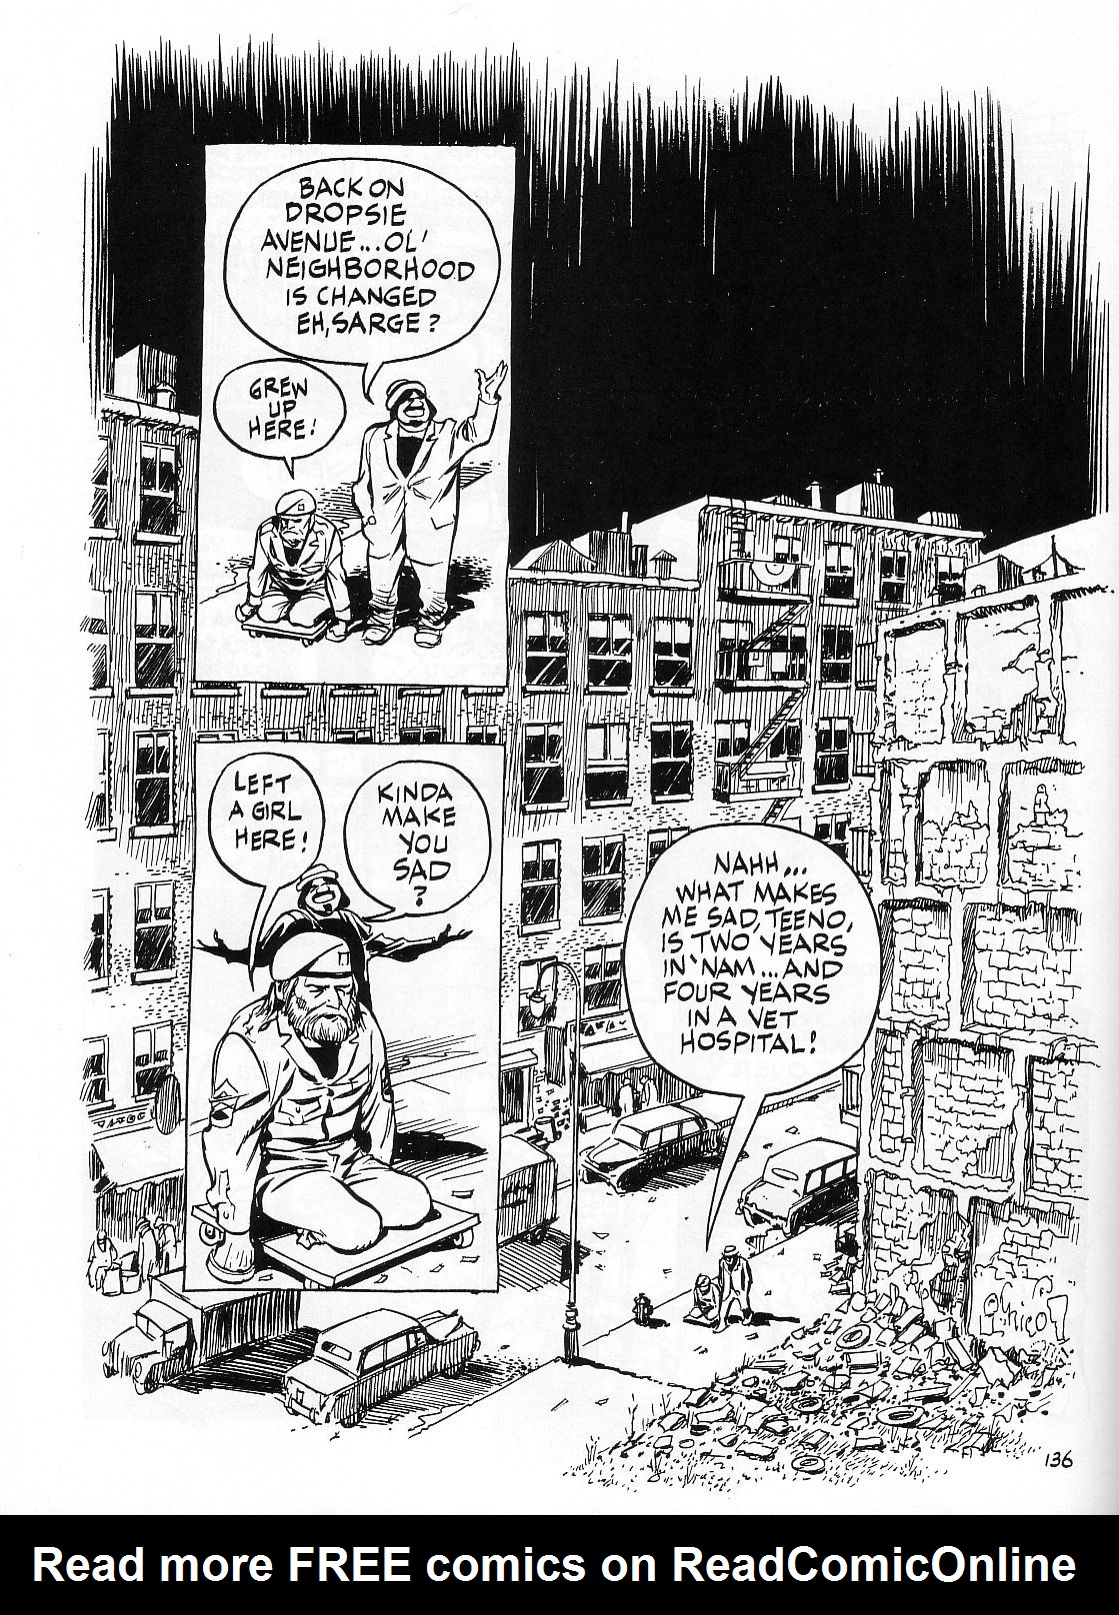 Read online Dropsie Avenue, The Neighborhood comic -  Issue # Full - 138